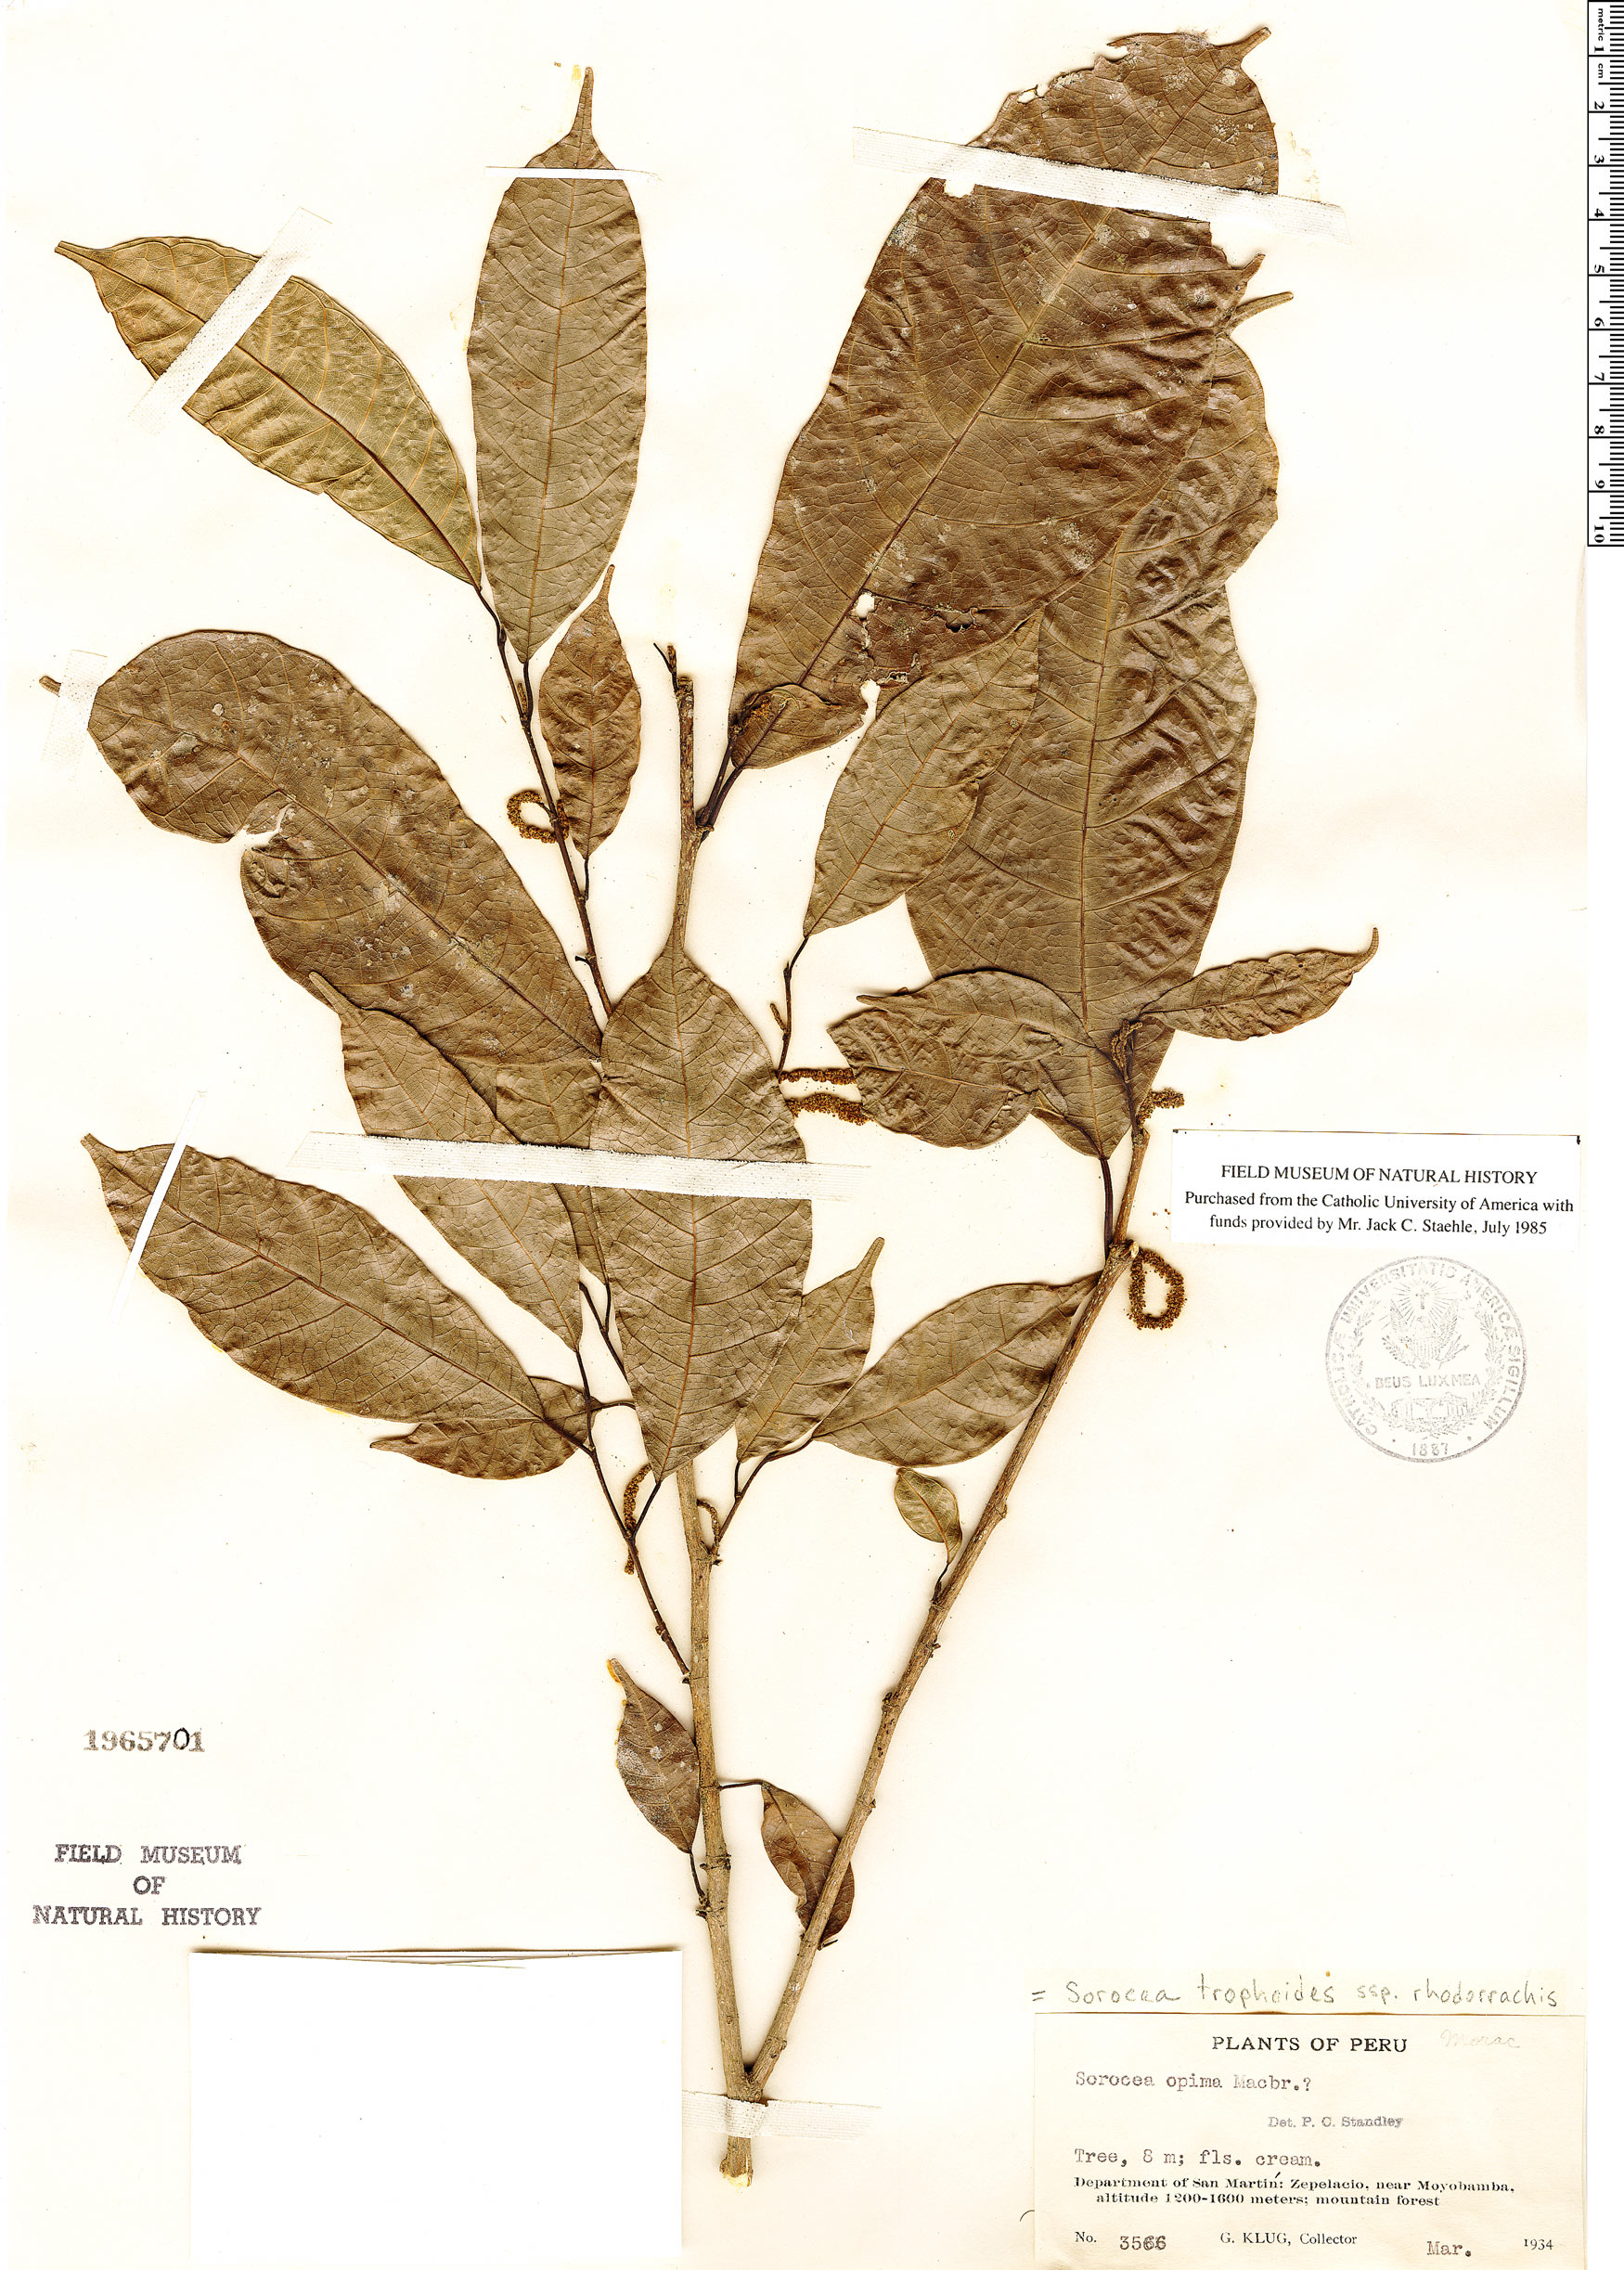 Specimen: Sorocea trophoides